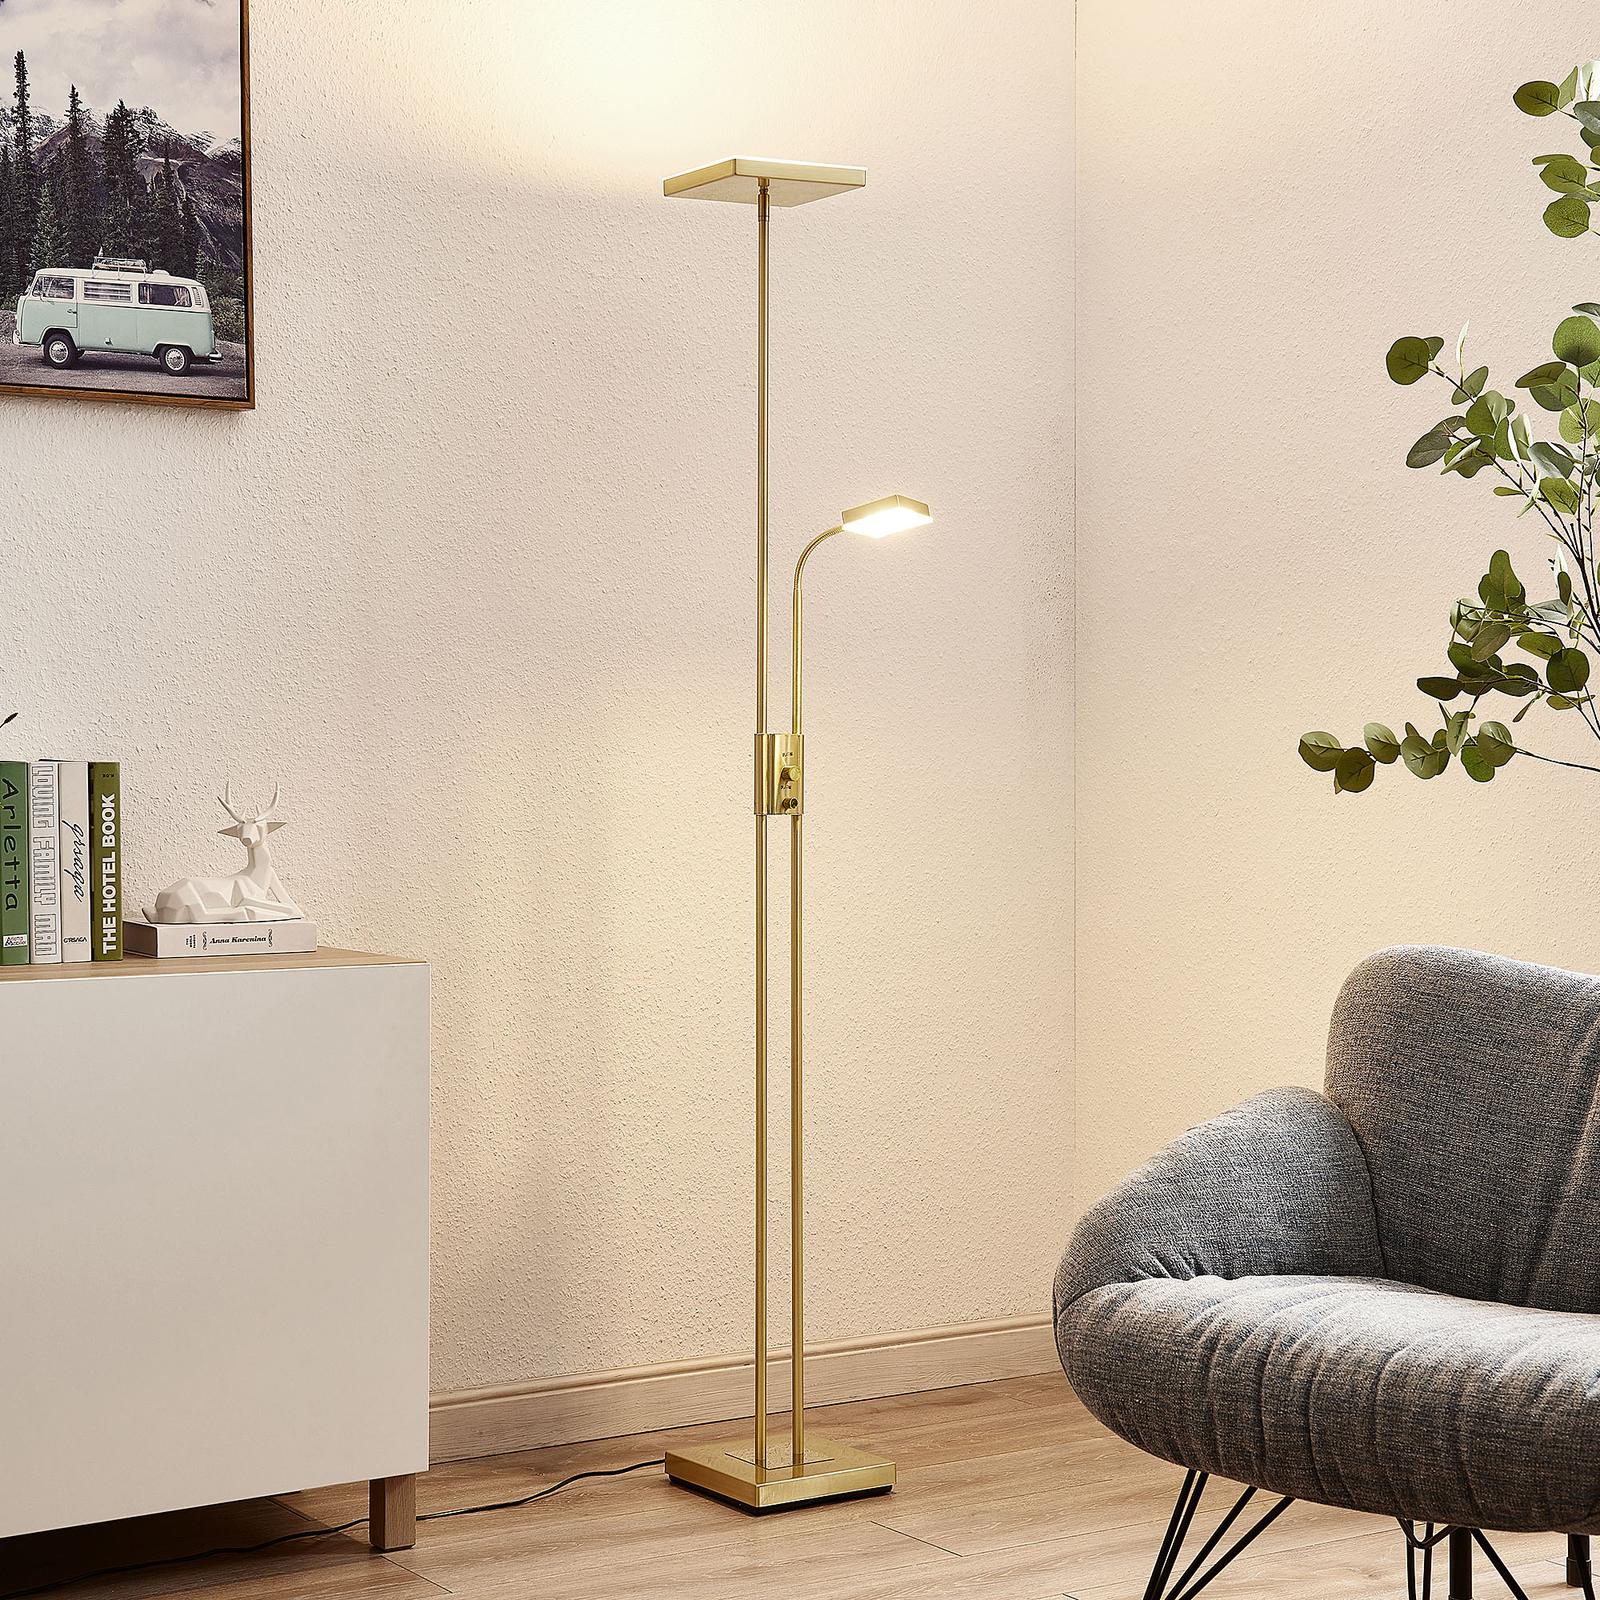 Lindby Seppa lampadaire LED, angulaire, laiton